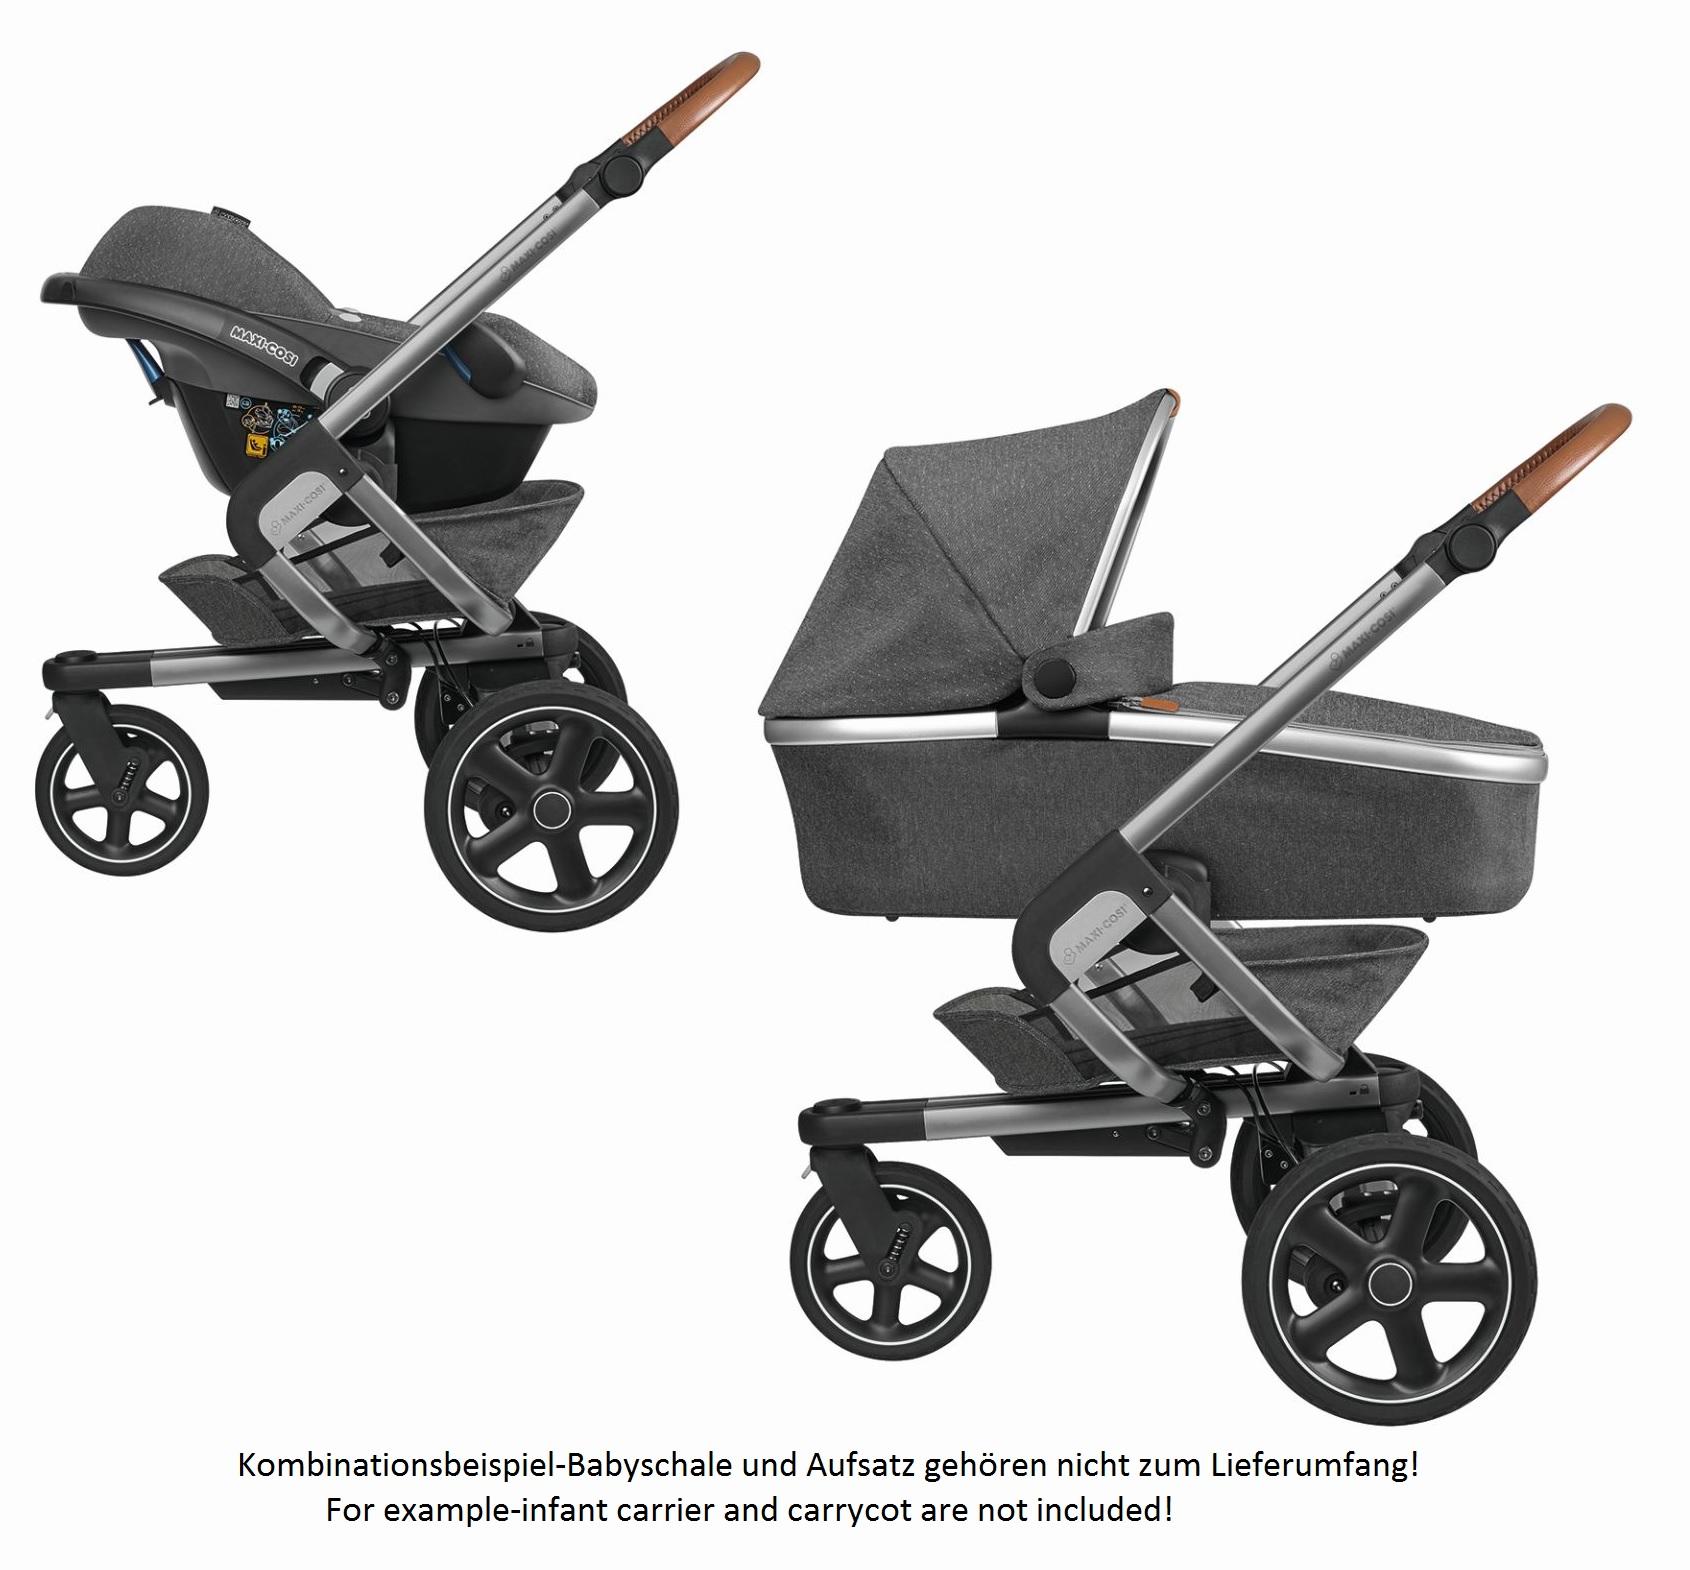 maxi cosi kinderwagen nova 3 rad buy at kidsroom strollers. Black Bedroom Furniture Sets. Home Design Ideas